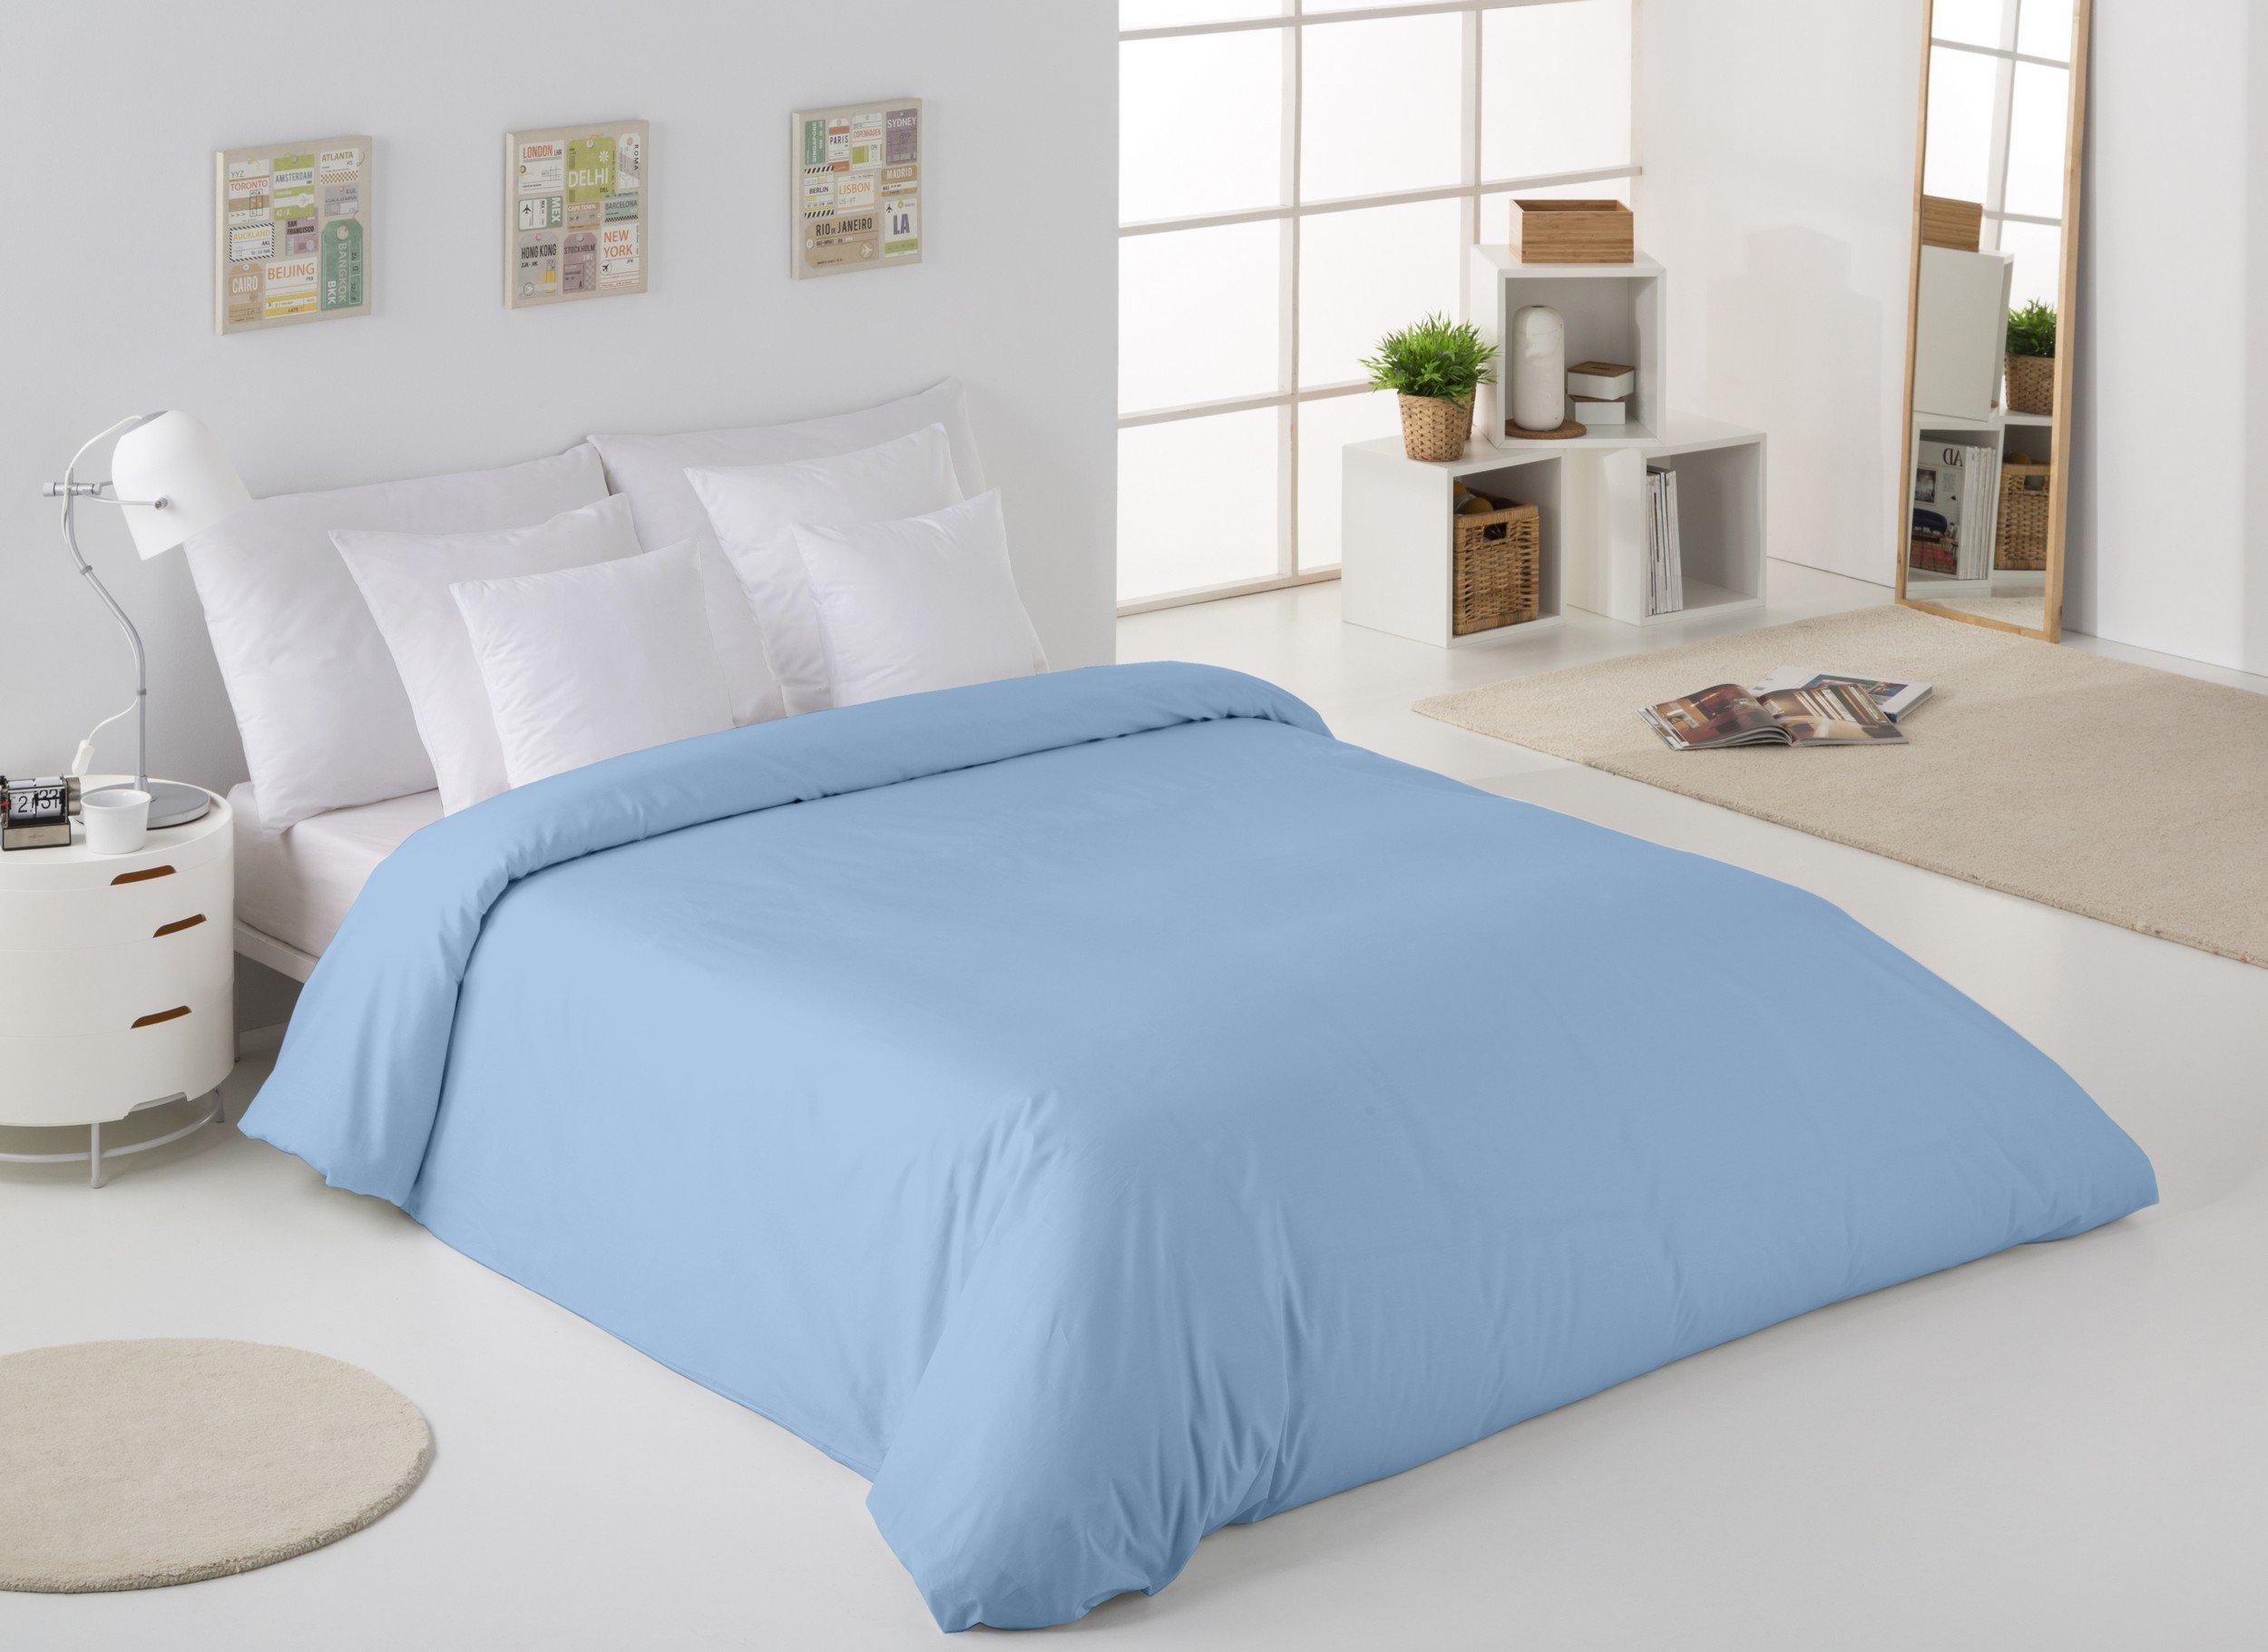 ESTELA - Funda nórdica Combi Color Azul Celeste - Cama de 105 cm. - 50% Algodón / 50% Poliéster - 144 Hilos: Amazon.es: Hogar